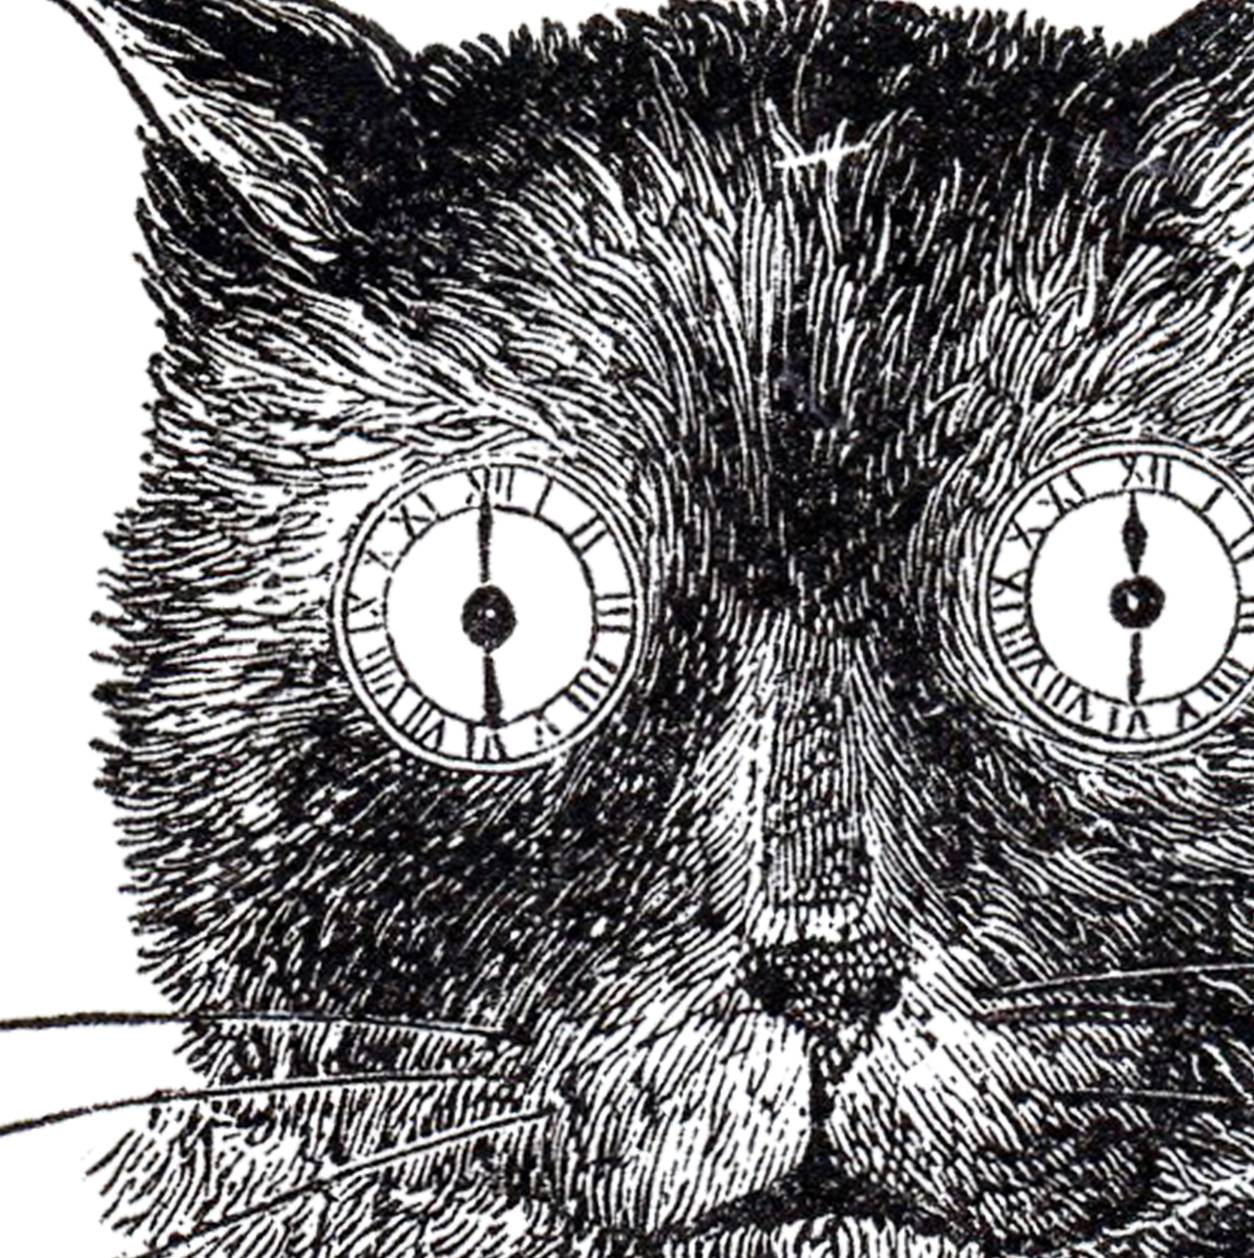 vintage steampunk cat image - odd